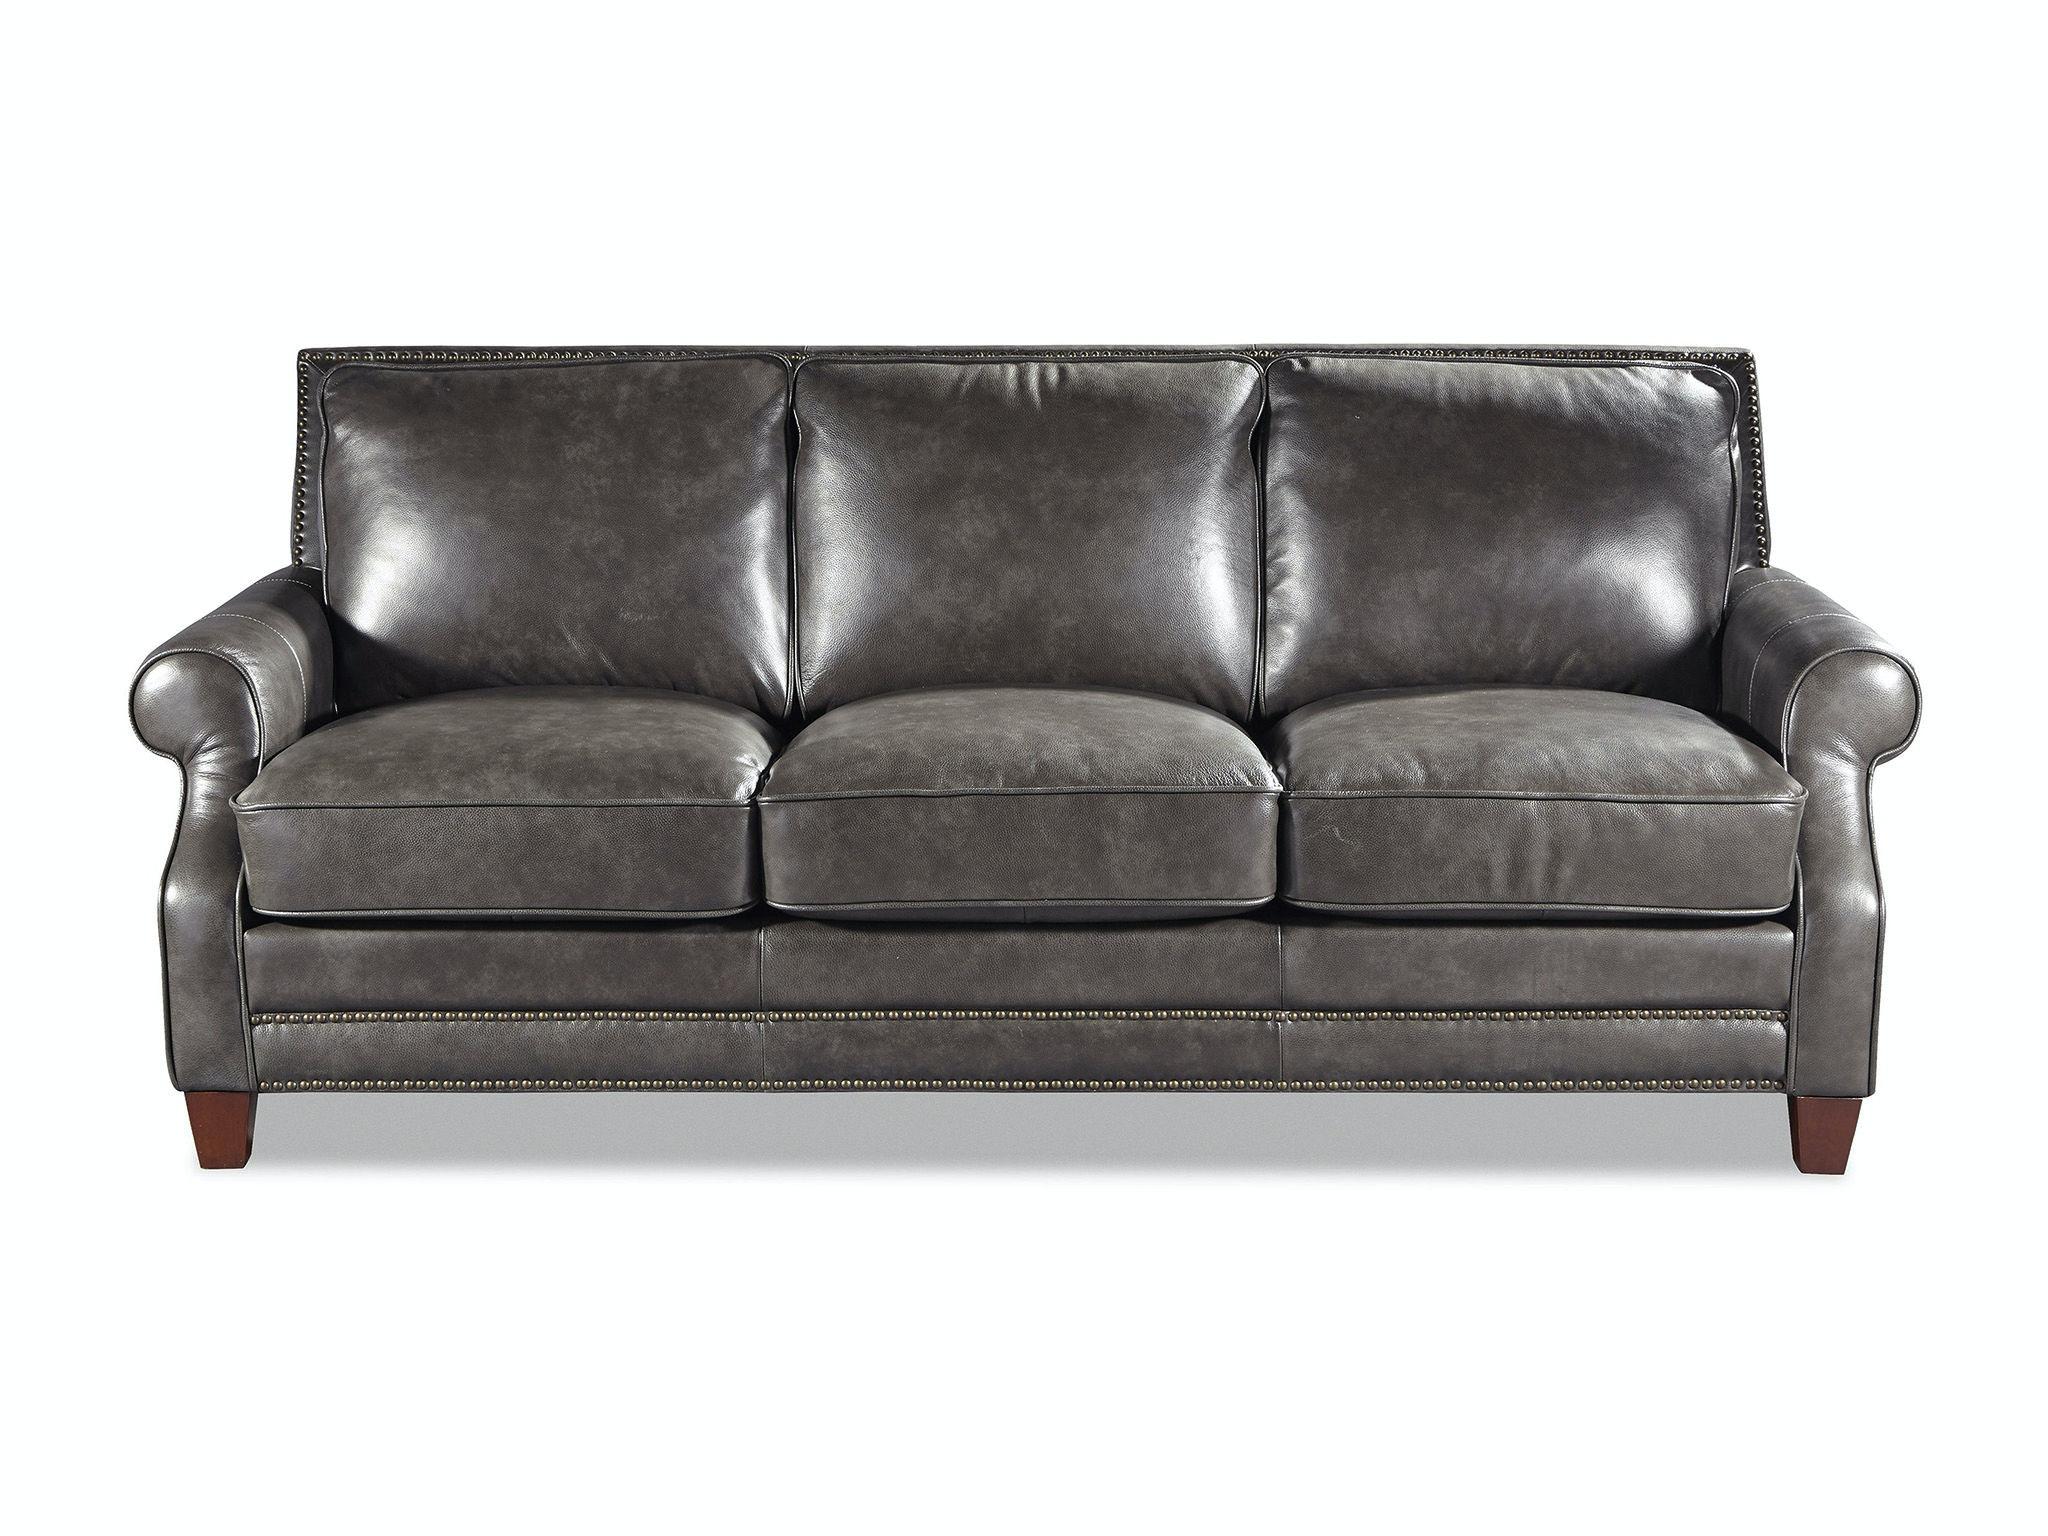 craftmaster living room furniture gray sectional sofa ideas l164050 hiddenite nc